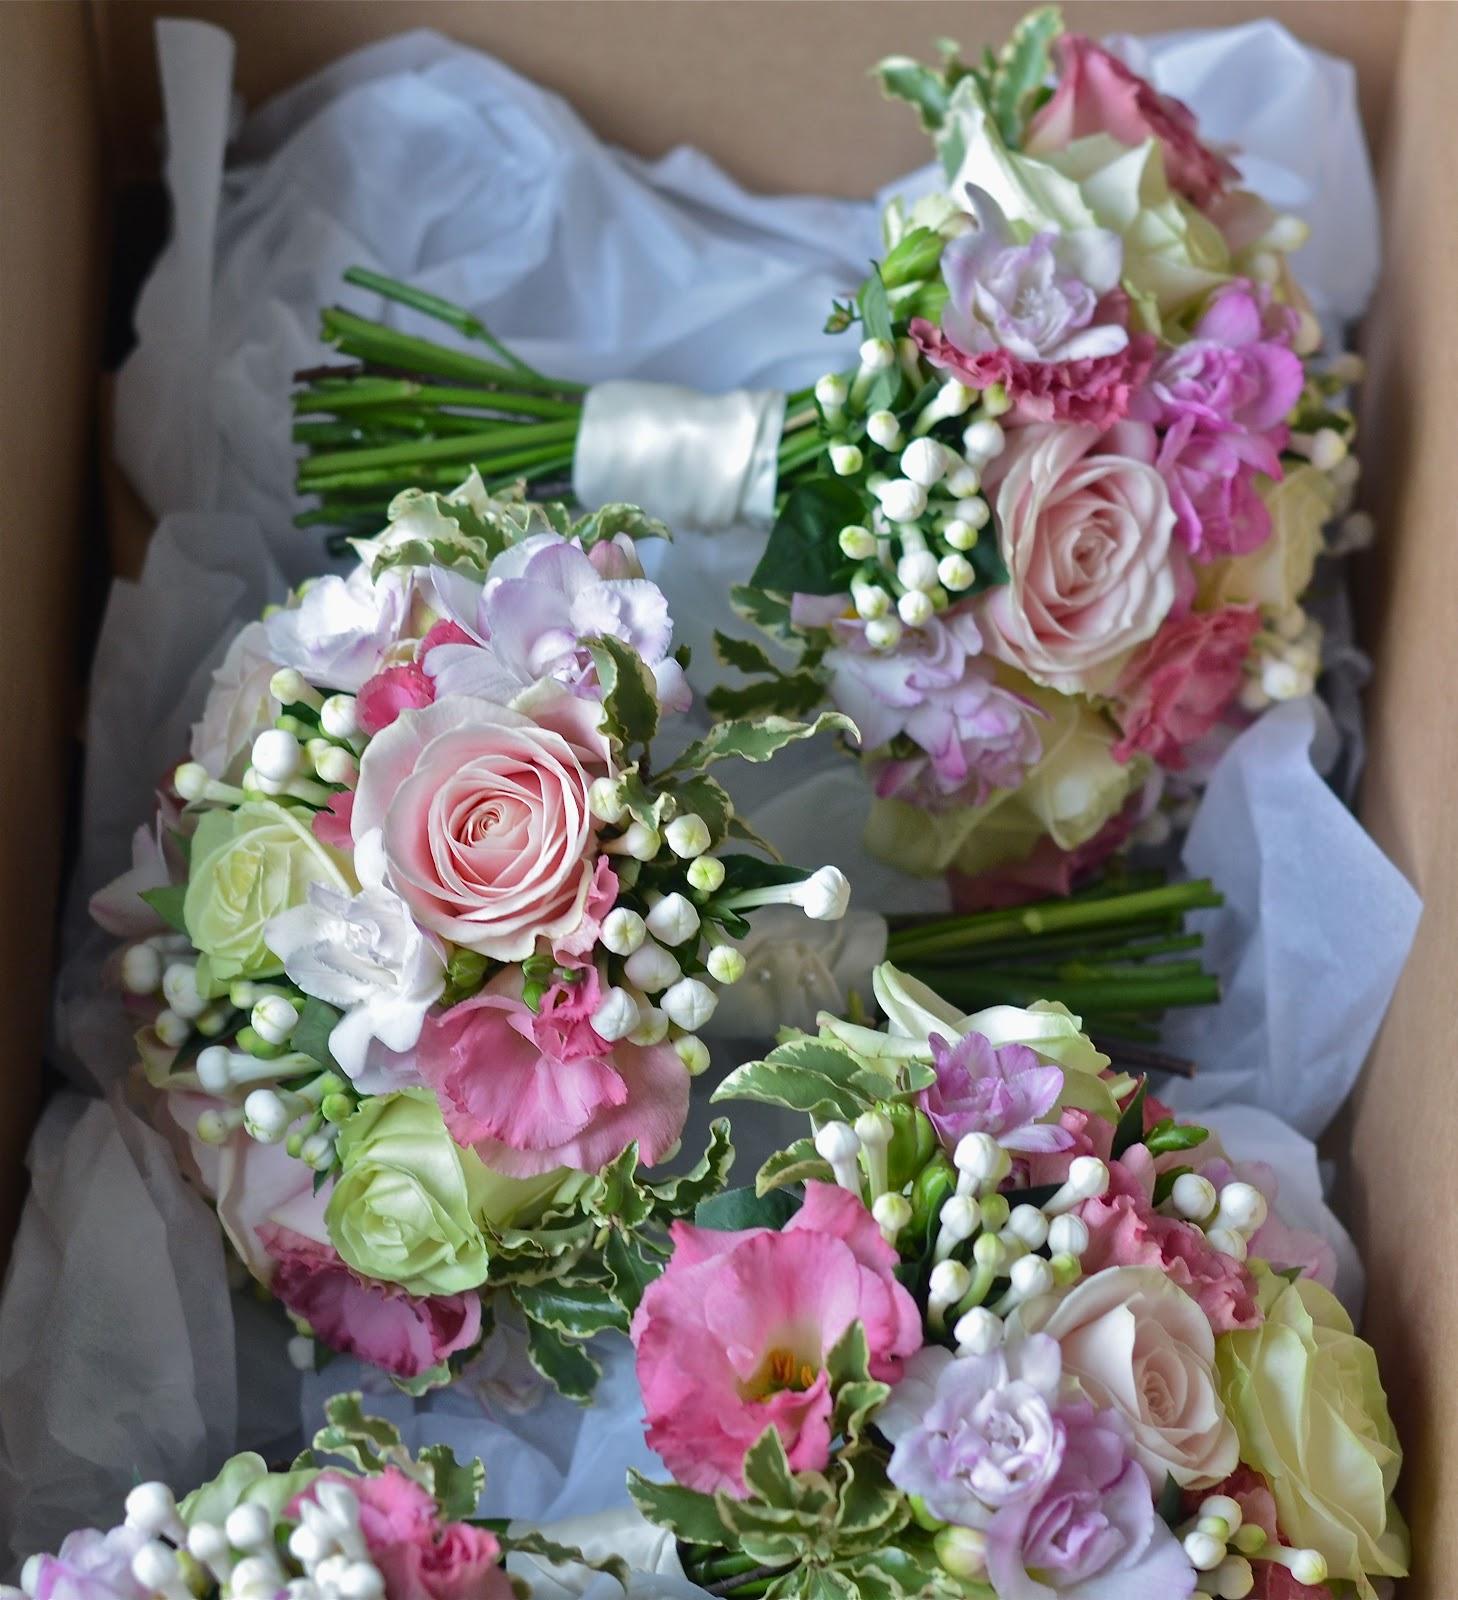 Easter Flowers Wedding: Wedding Flowers Blog: Kate's Easter Wedding Flowers